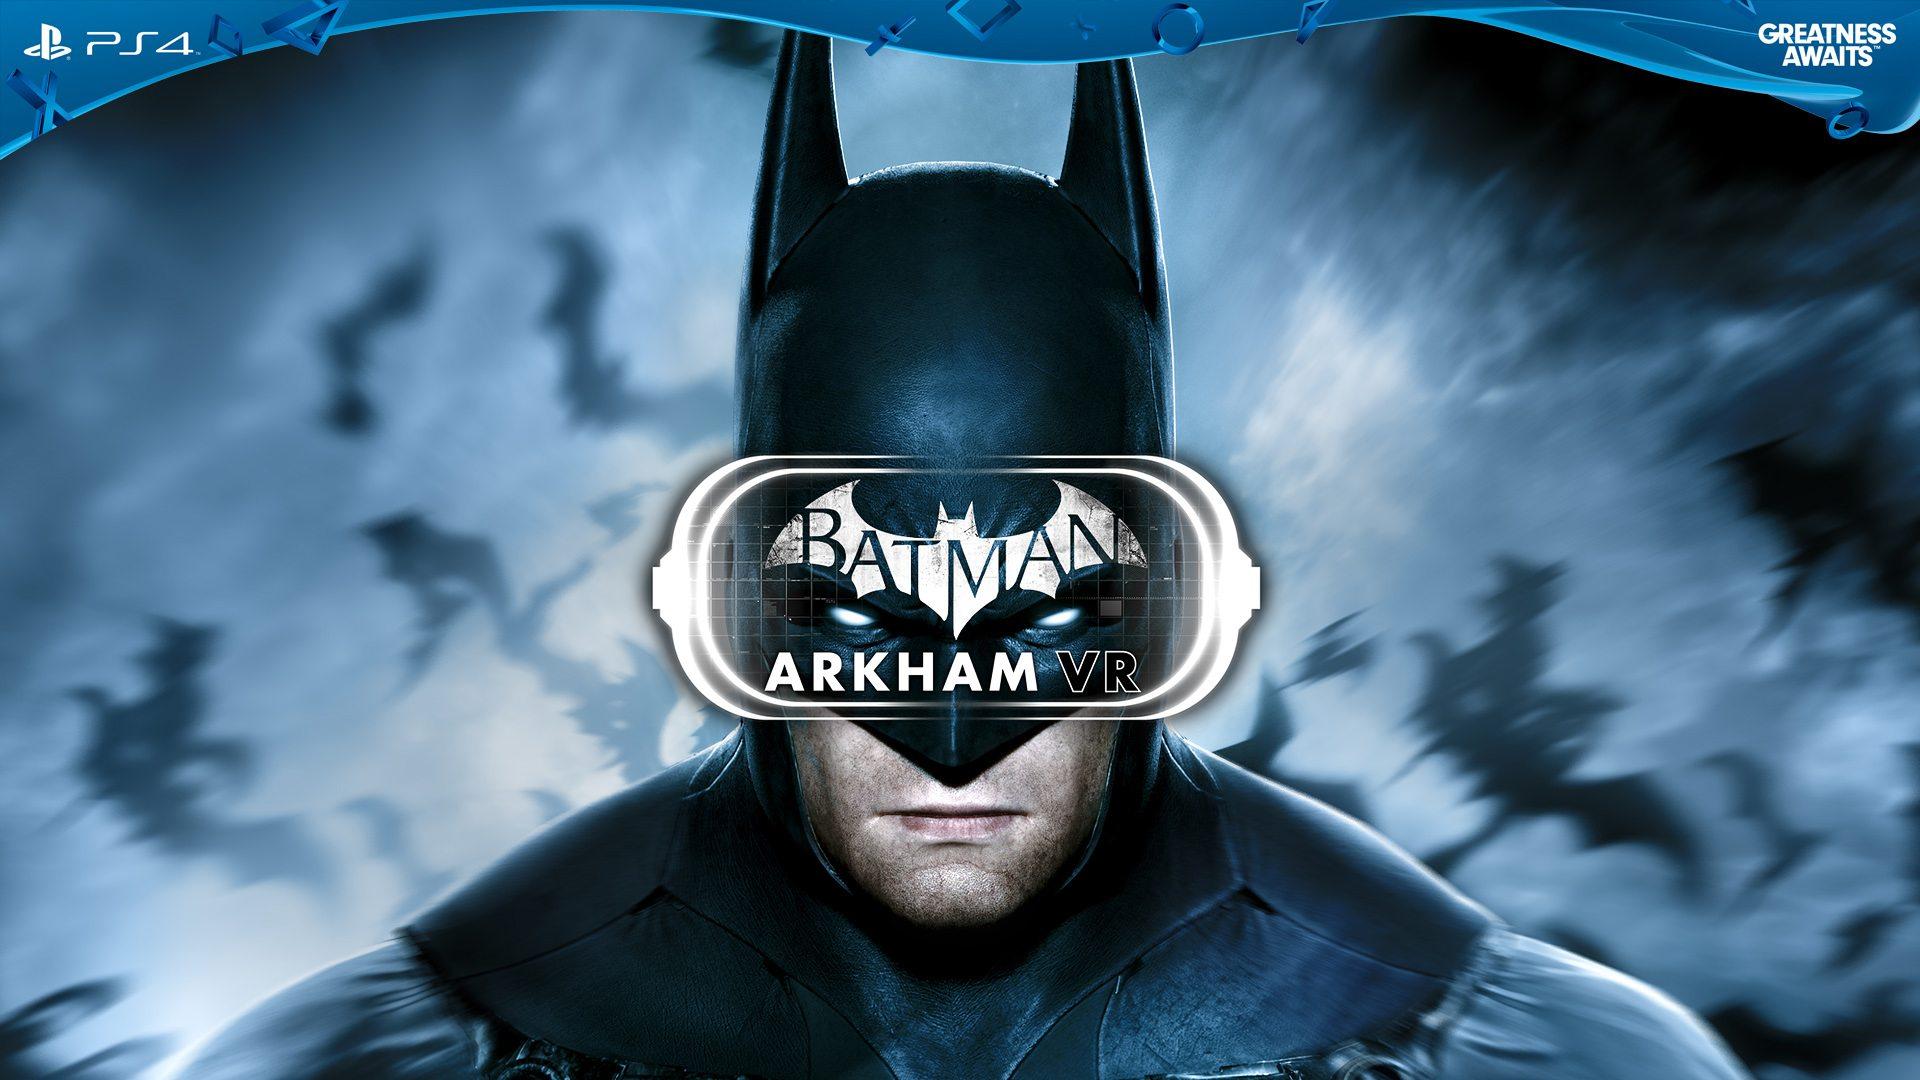 Batman: Arkham VR Launched by Warner Bros. for PlayStation VR